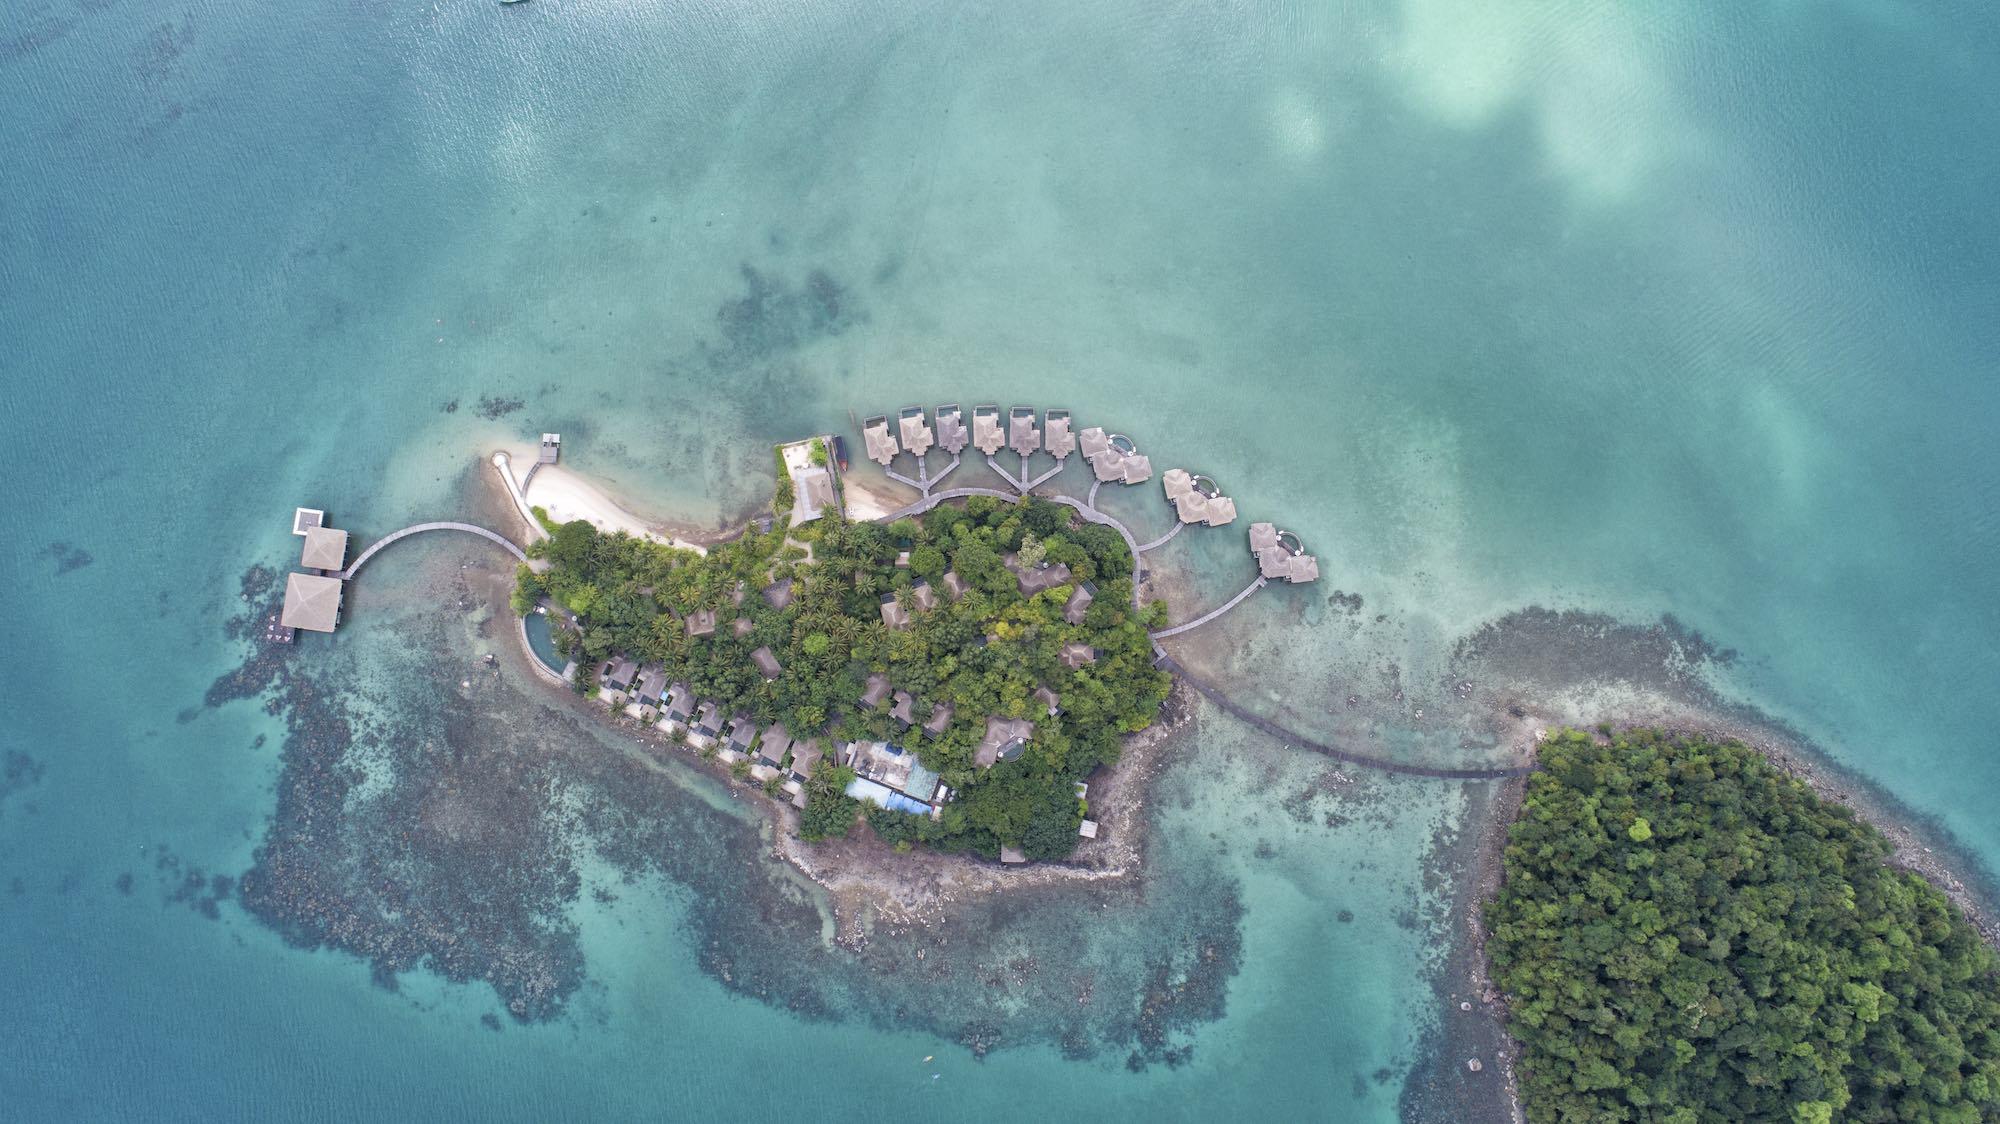 Hospitality hotel resort luxurious luxury photography services singapore asia photographer travel drop island